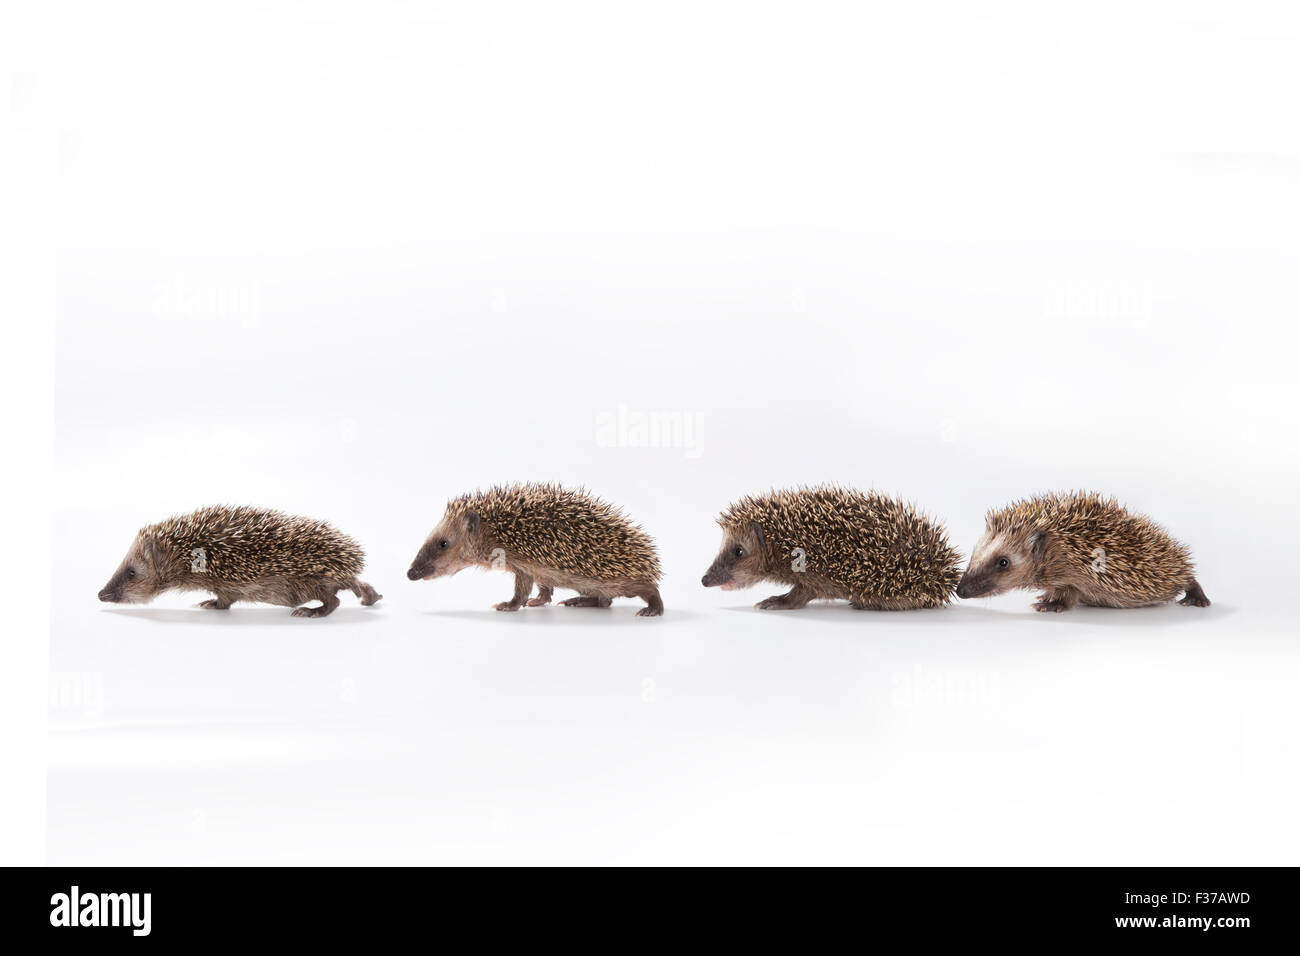 European hedgehog (Erinaceus europaeus), four young hedgehogs walking in a line, captive - Stock Image